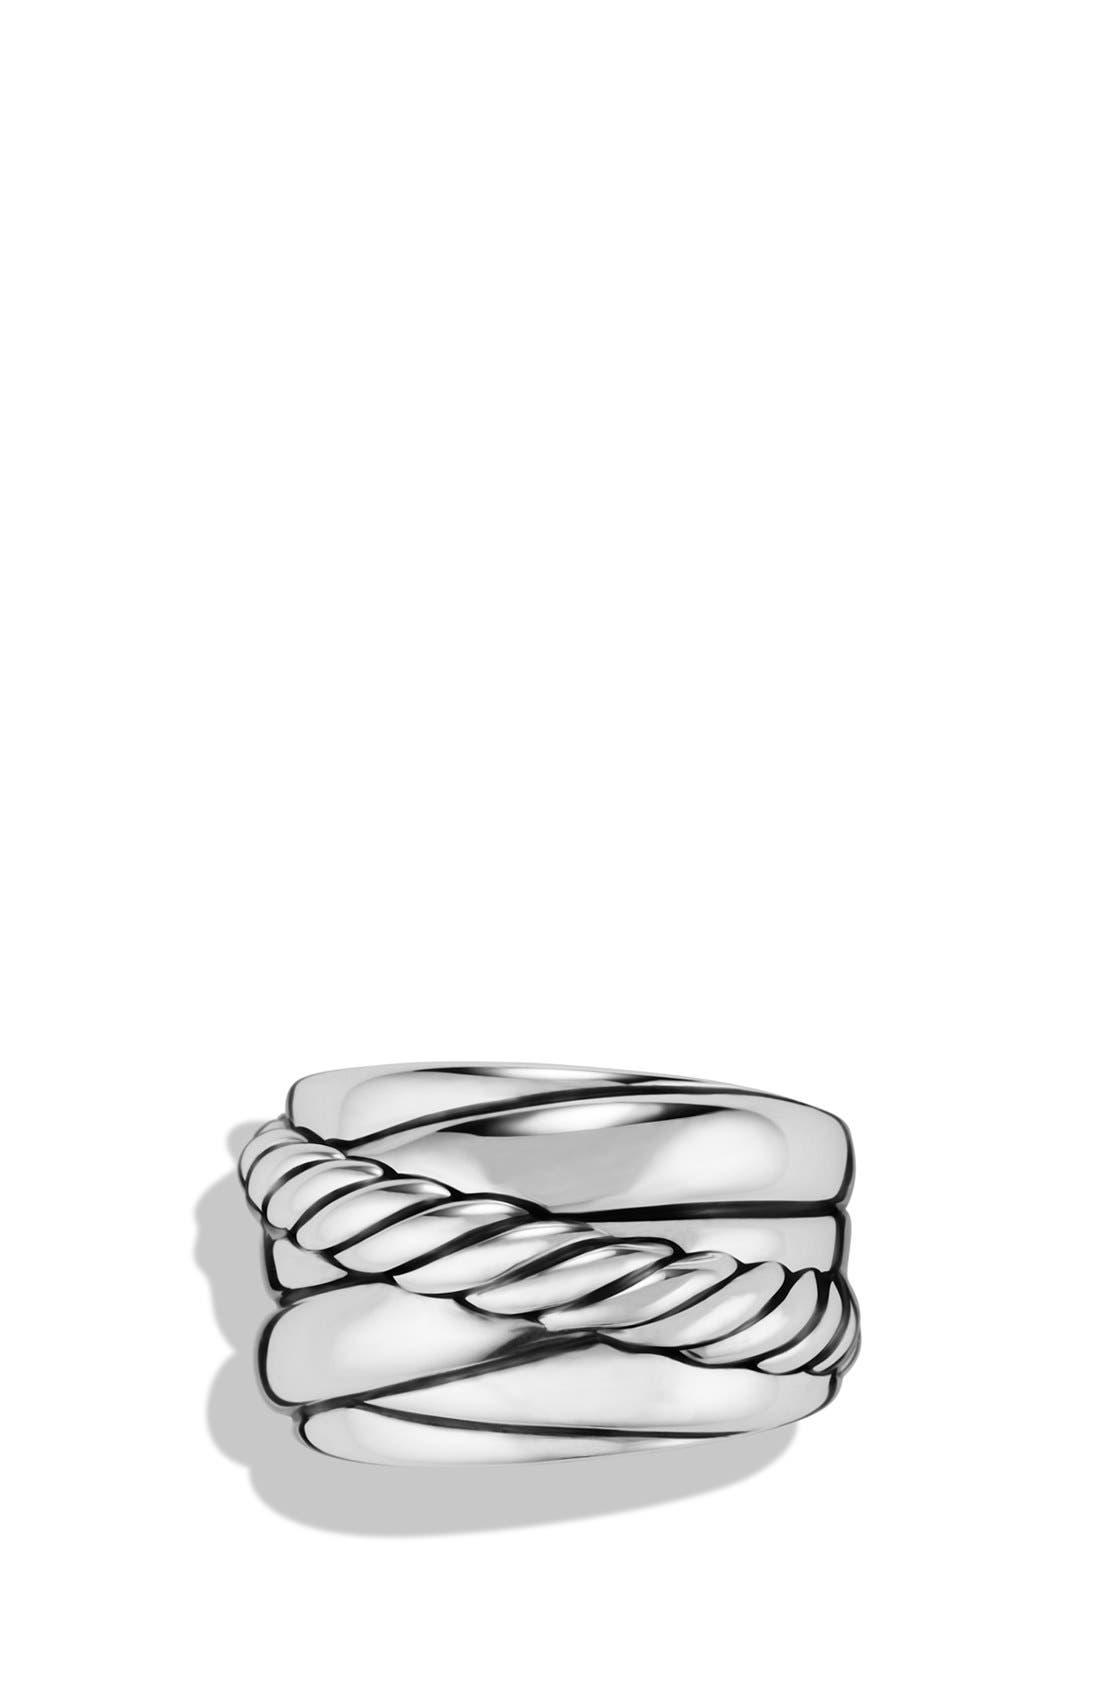 Alternate Image 3  - David Yurman 'Crossover' Wide Ring